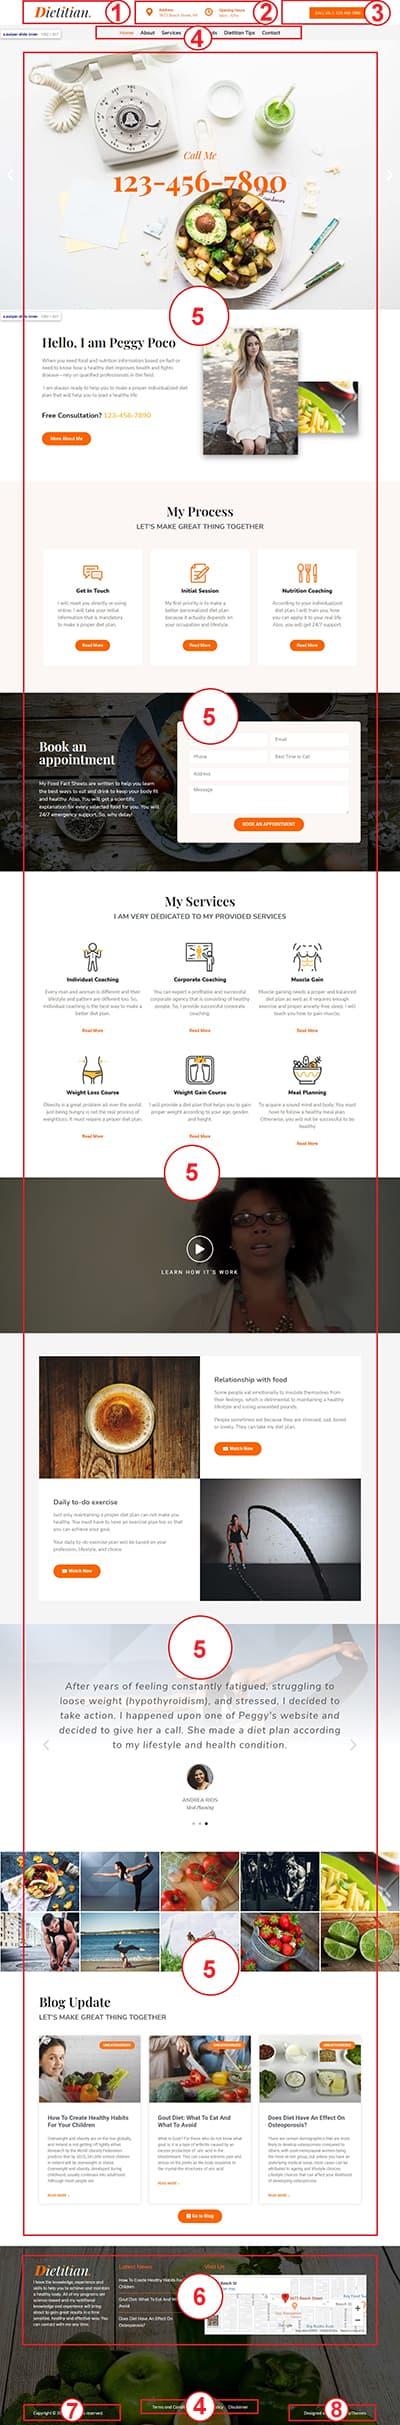 Diet & Nutrition WordPress Theme – Dietitian Pro Documentation